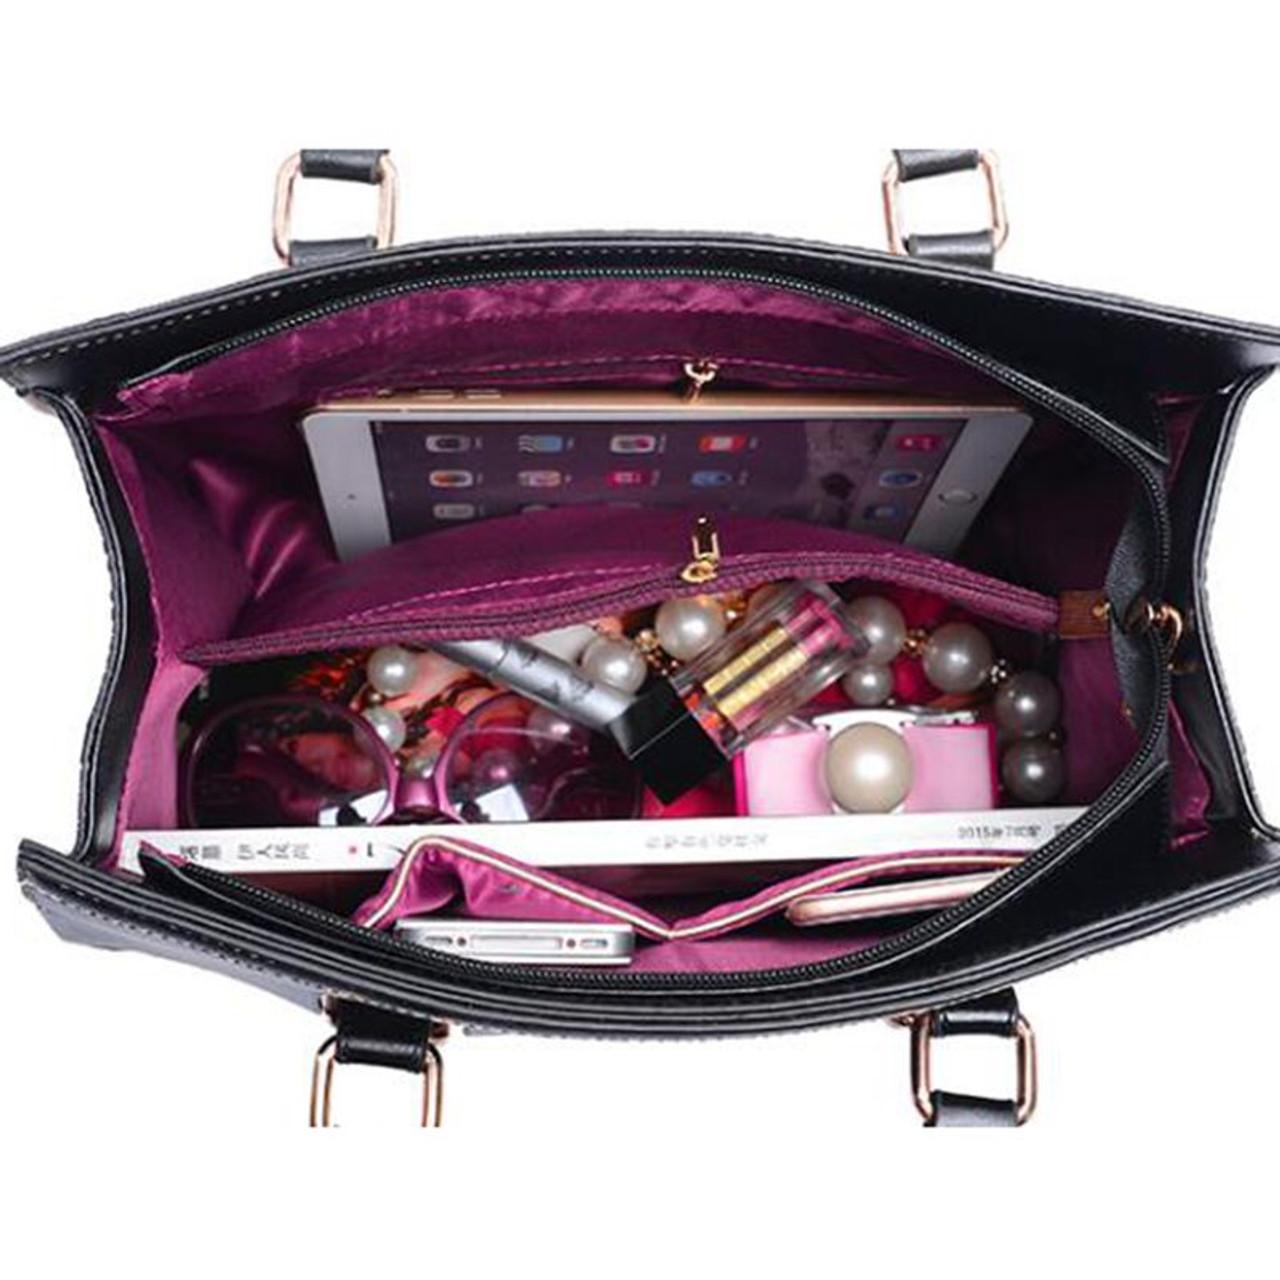 5aa5528f7a4d1 ... 5Piece Set 2018 New Women Bags Leather Handbags Fashion Shoulder Bag  Female Purse Ladies Crossbody ...